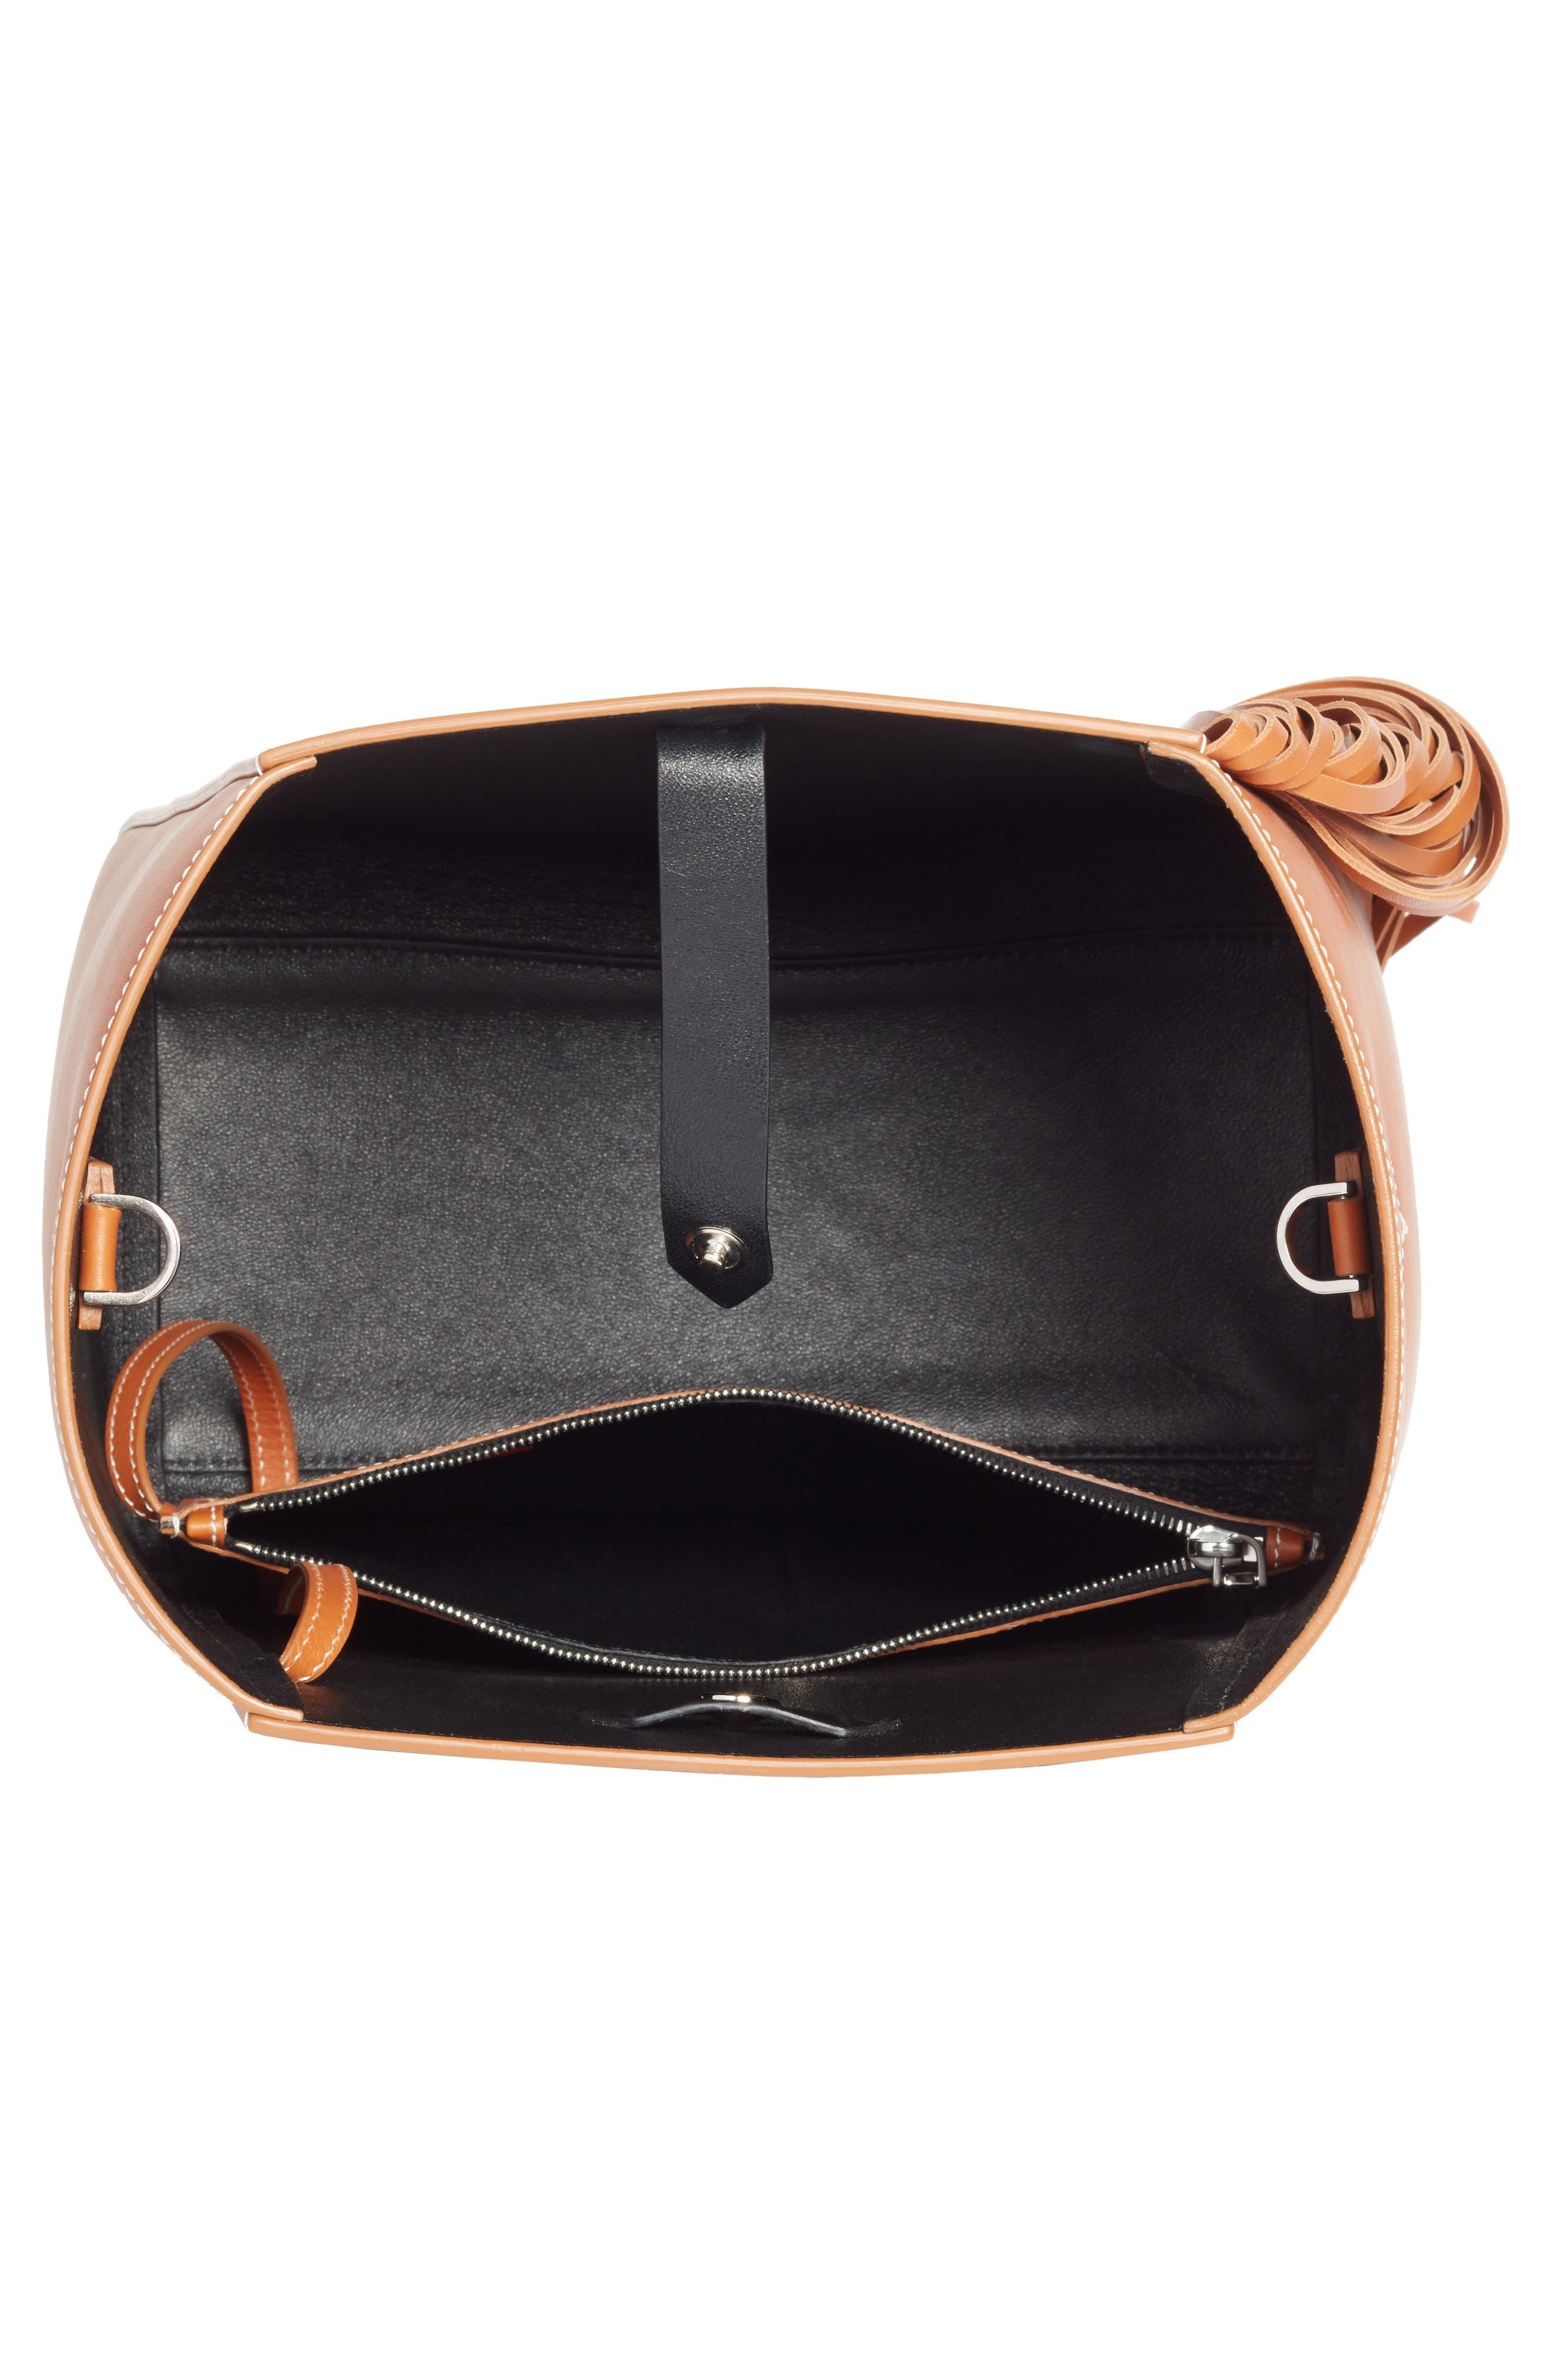 Fringe Leather Bucket Bag,                             Alternate thumbnail 3, color,                             COGNAC